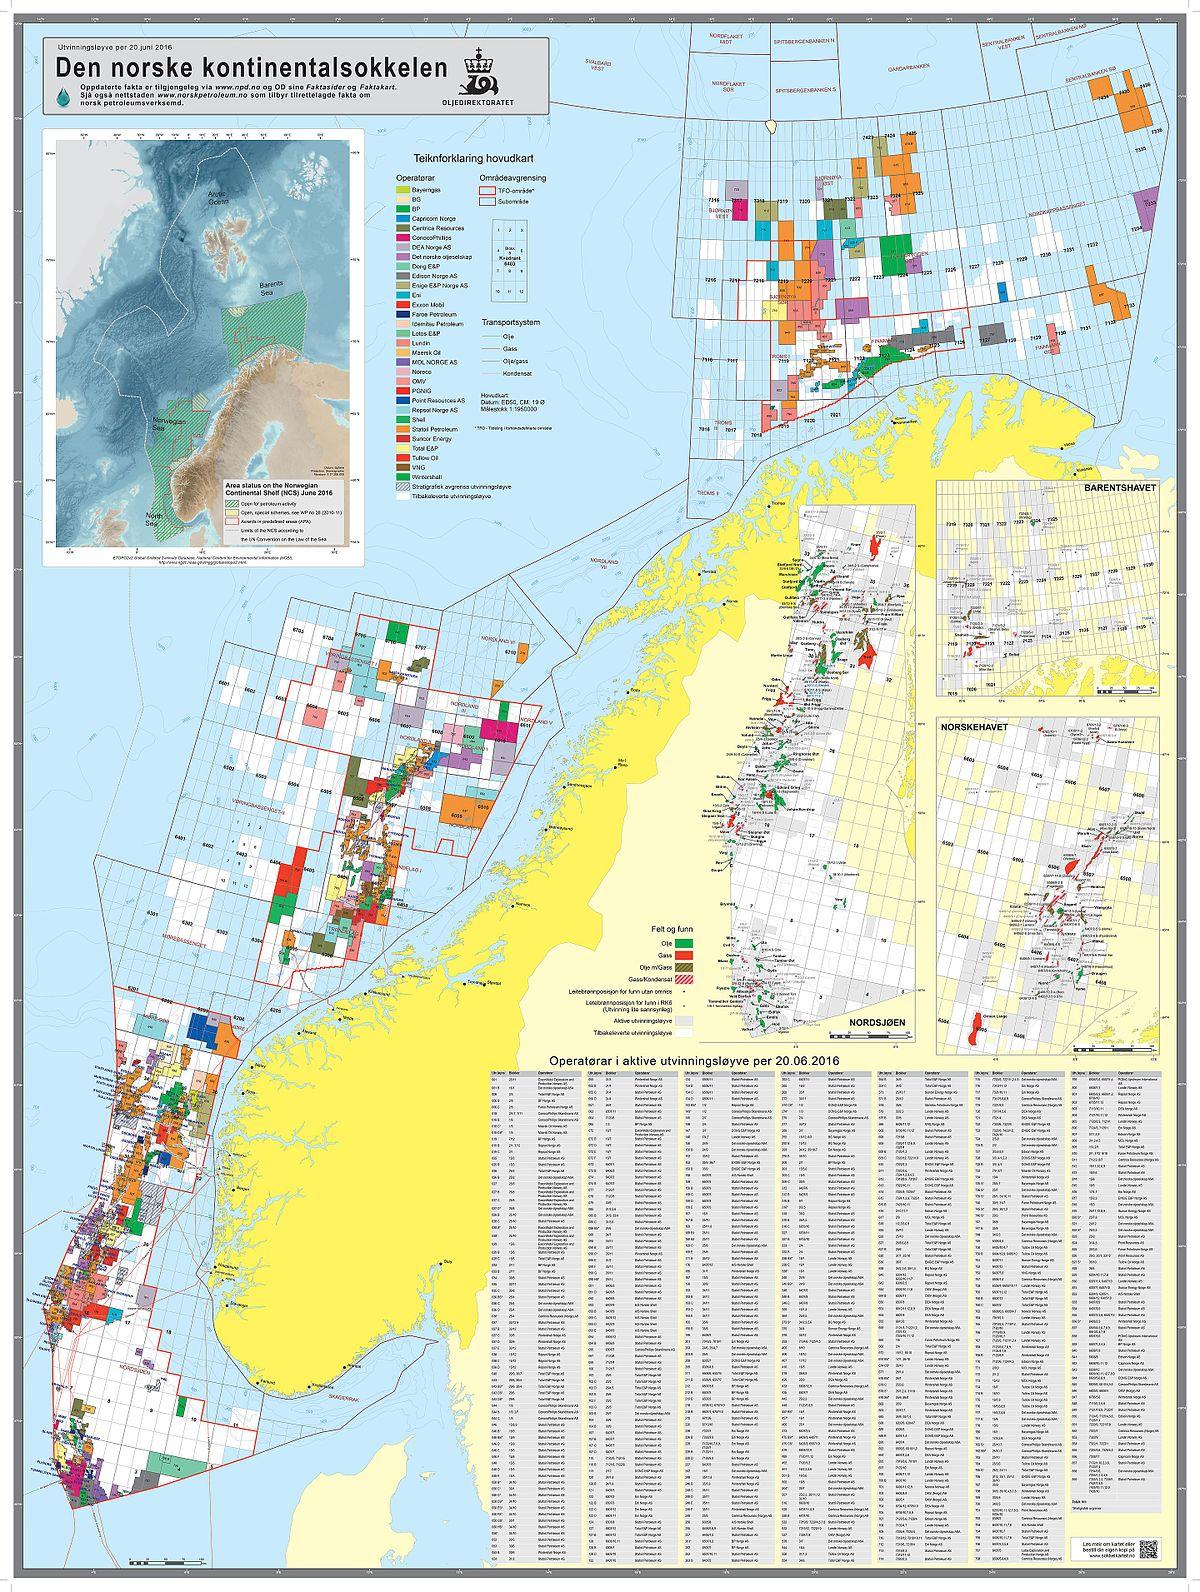 Norwegian Continental Shelf Wikipedia